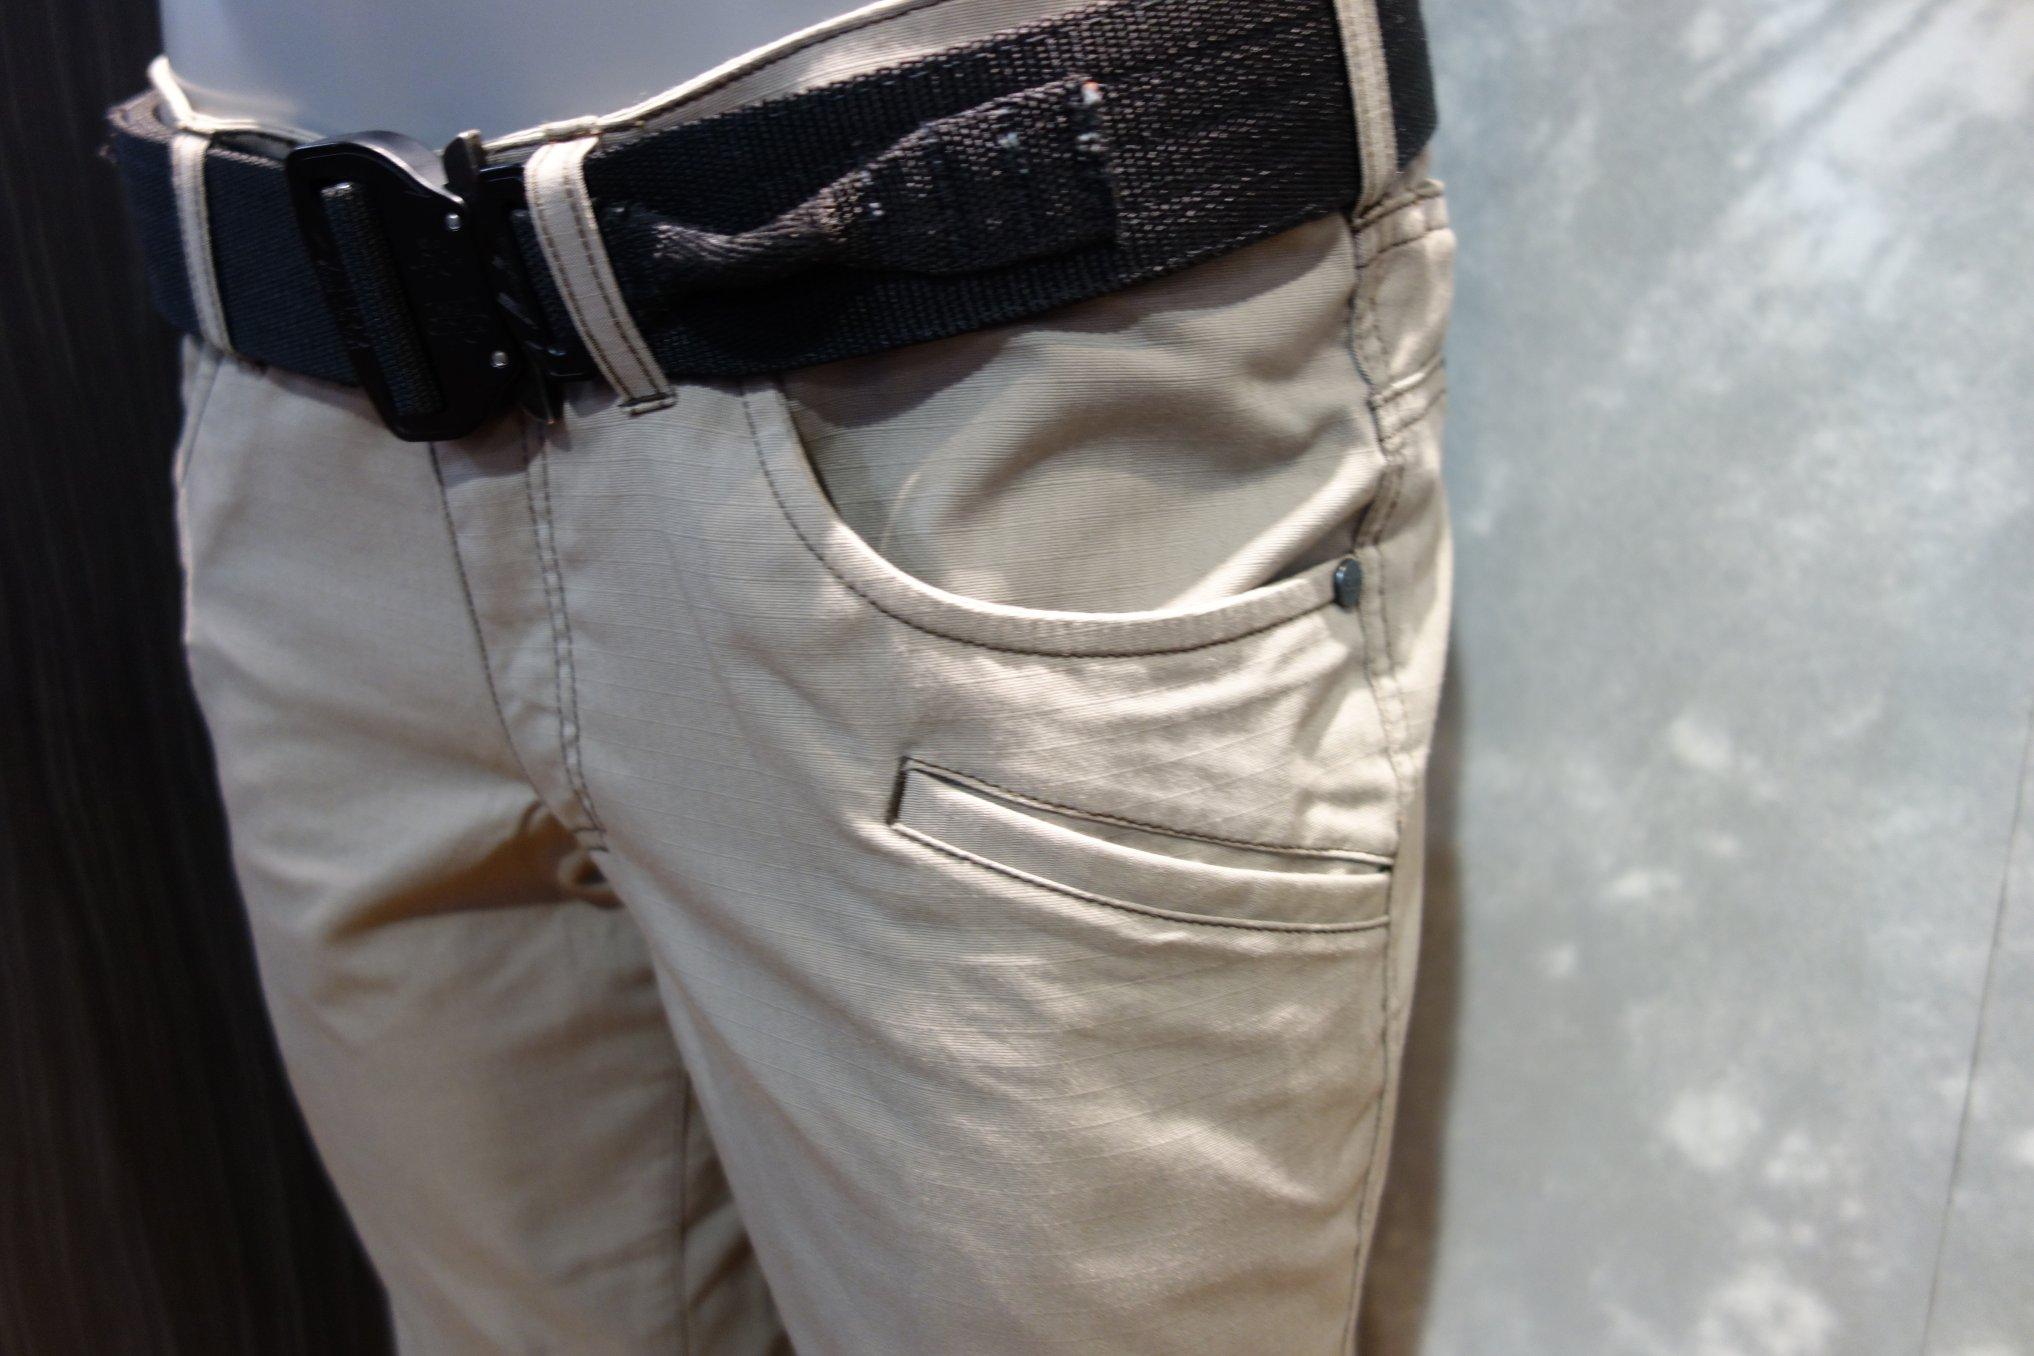 6b1bd011e44 5.11 Tactical Women s Cirrus Pants Combat Tactical Pants for Female ...